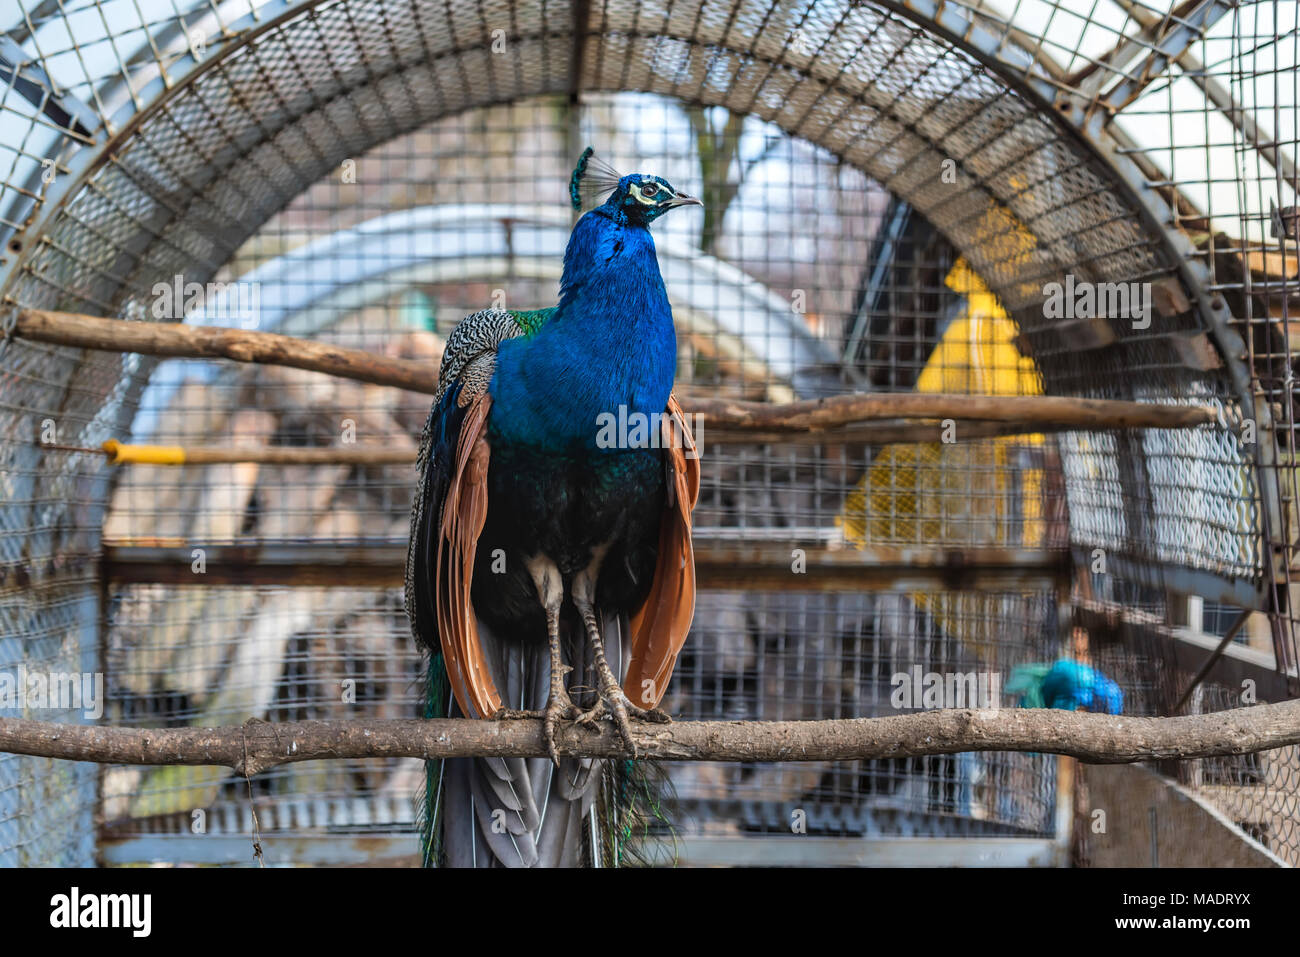 Peacock or pavo cristatus perches in cage close - Stock Image